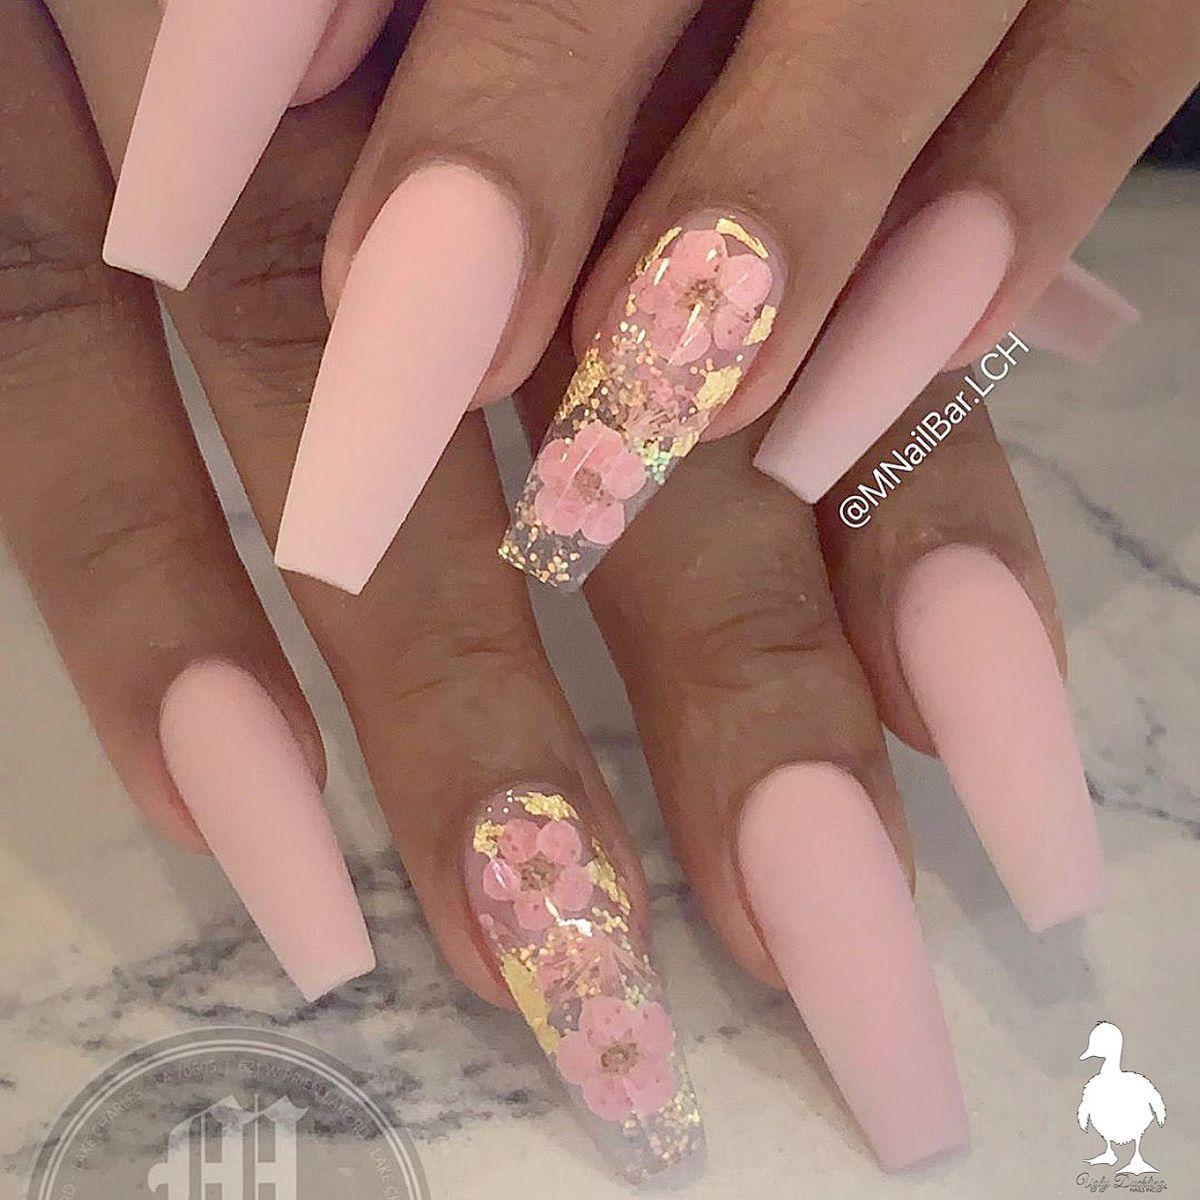 25+ Nail Art ideas in 25   nail art, nail designs, cute nails